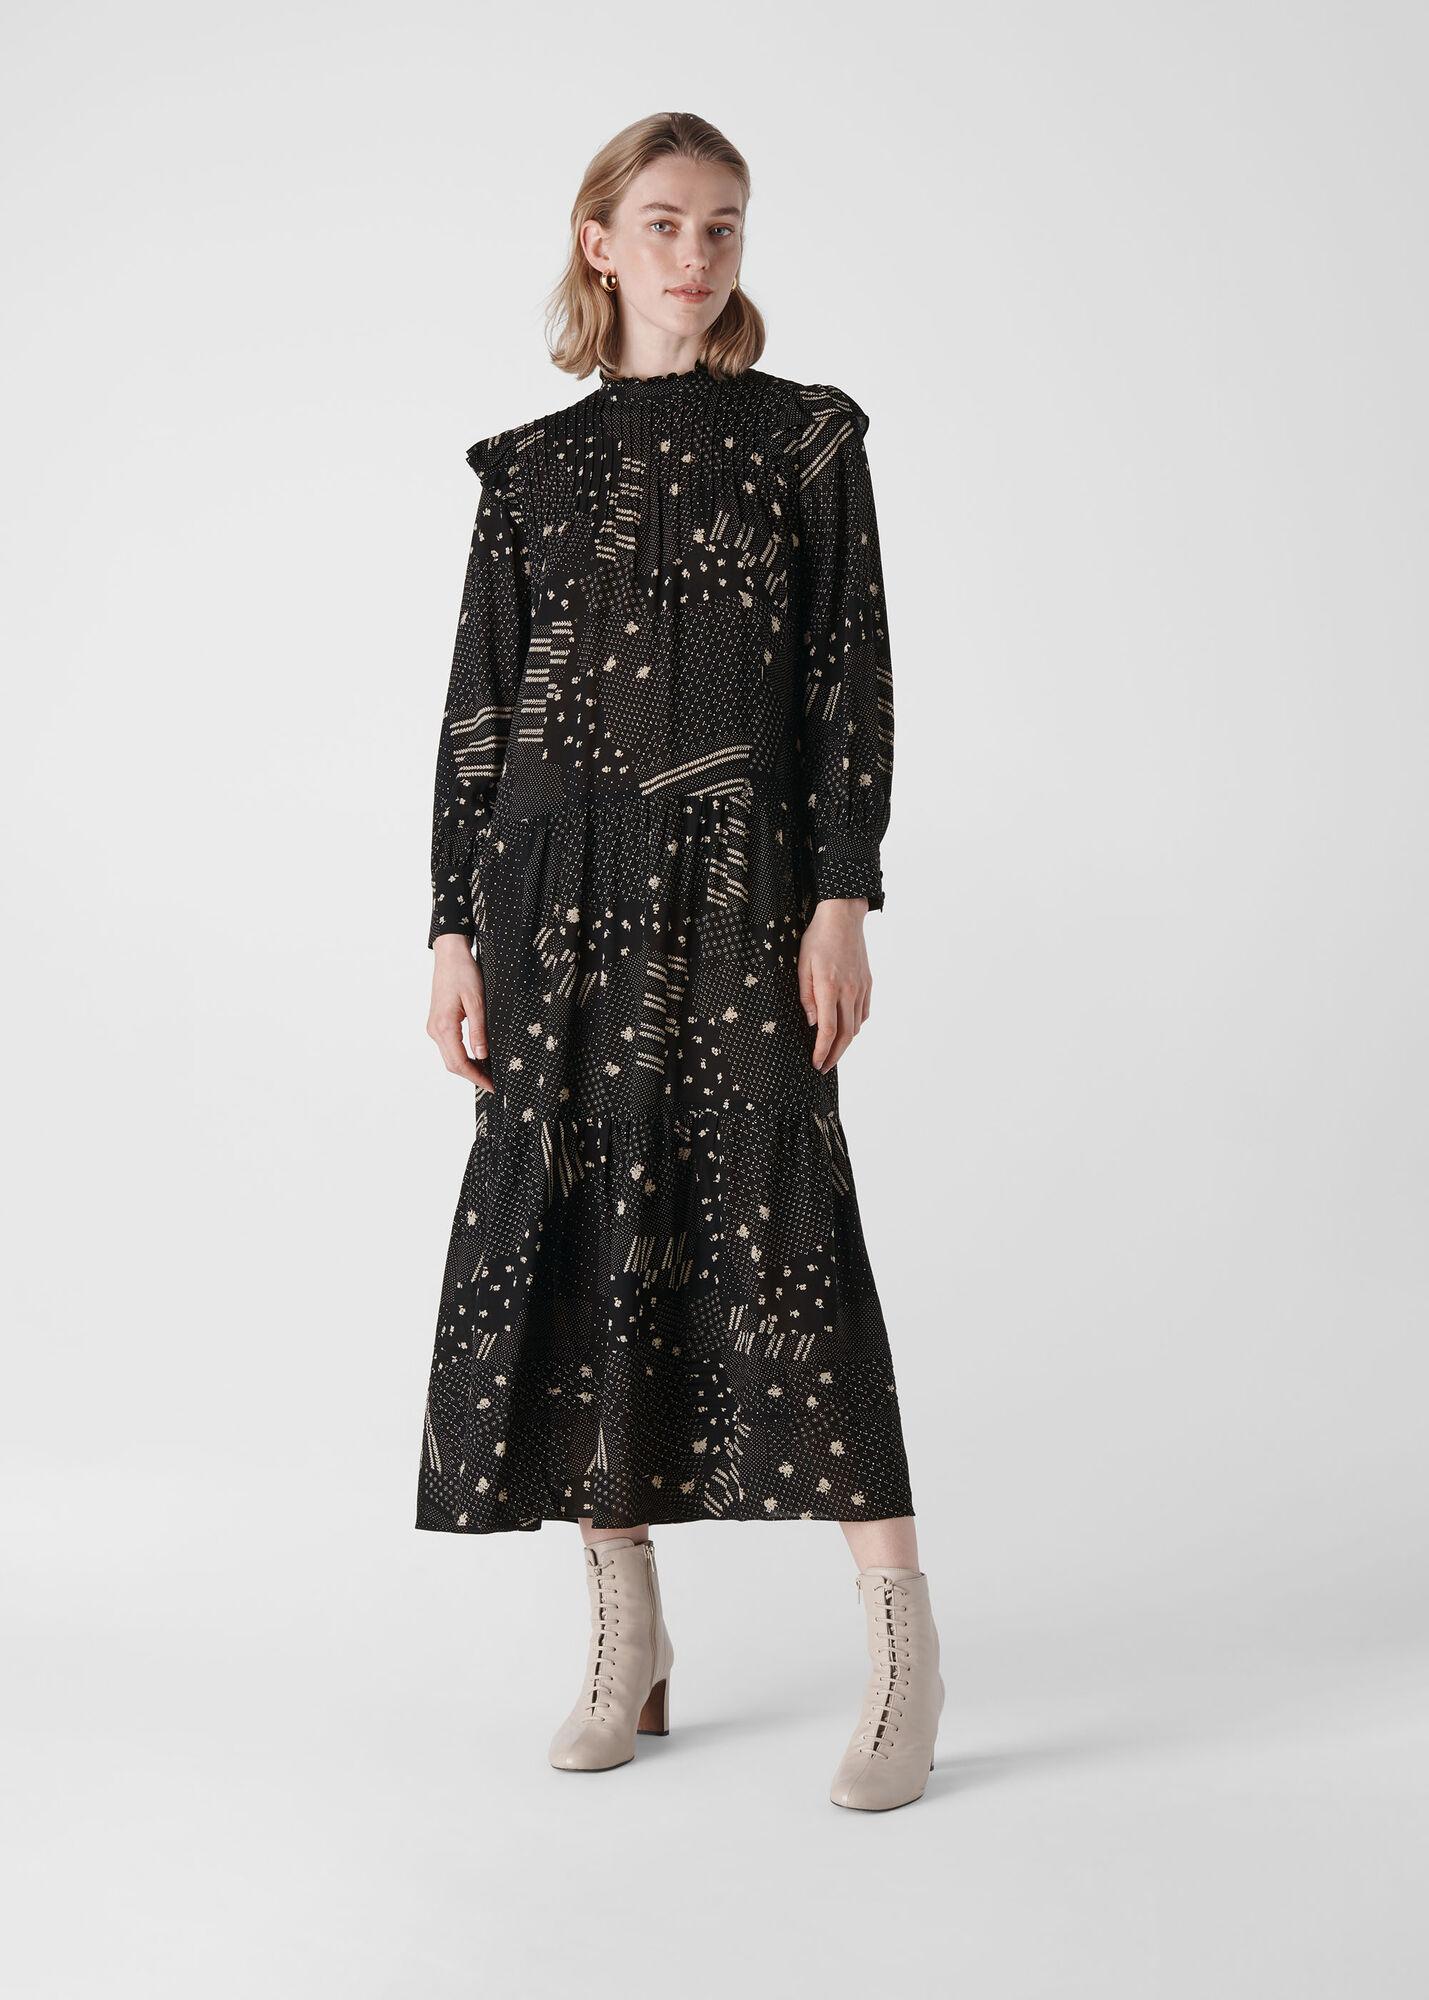 Ona Patchwork Print Dress